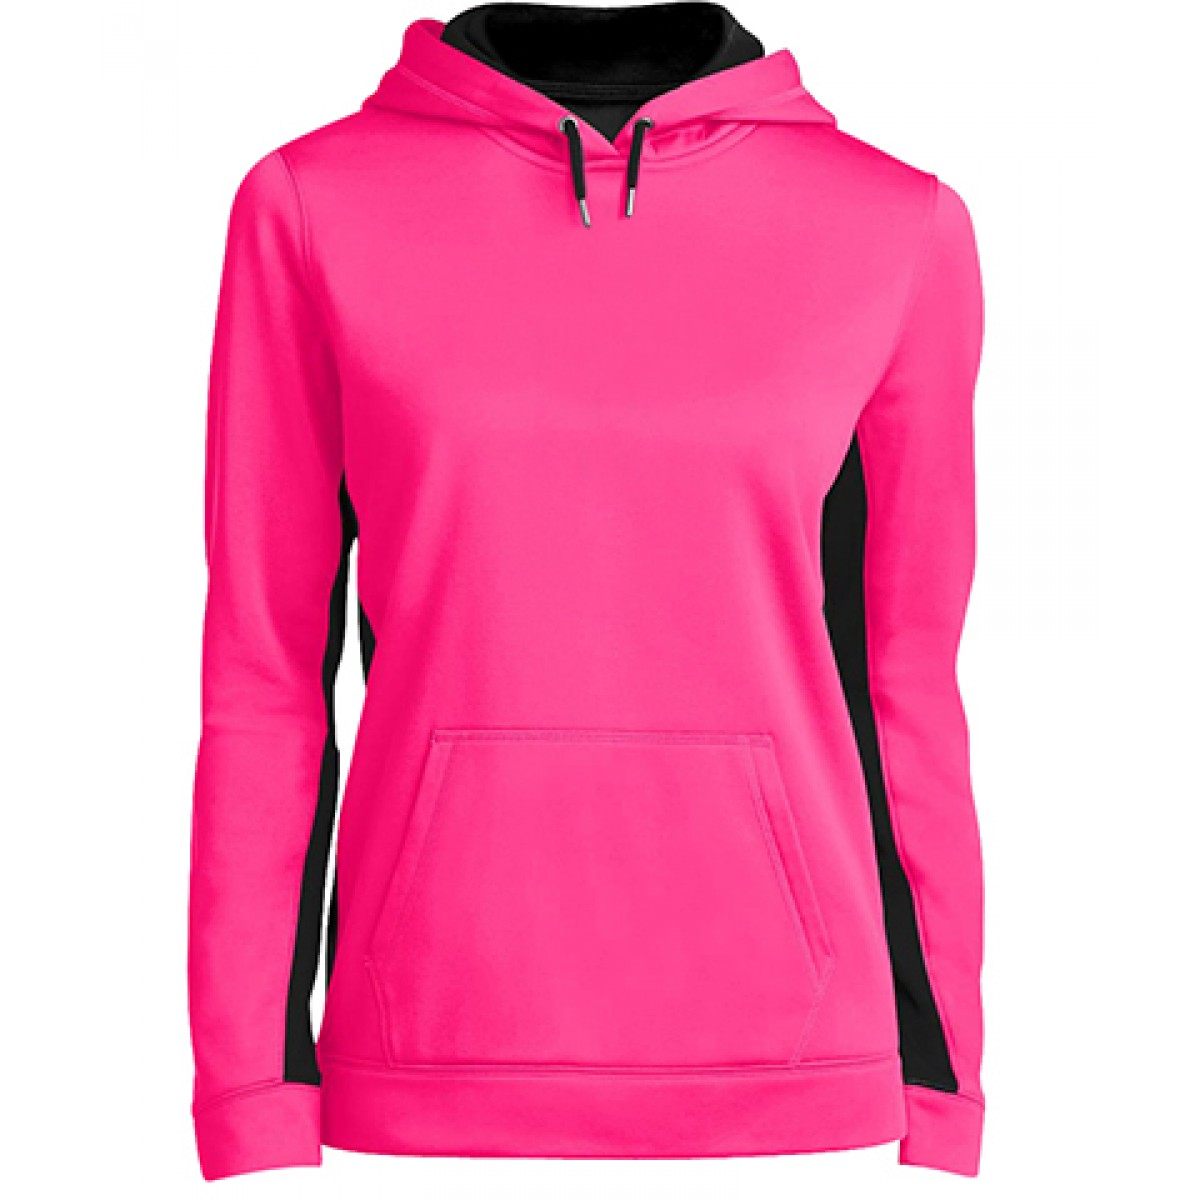 Ladies Colorblock Hooded Pullover-Neon Pink Black-S